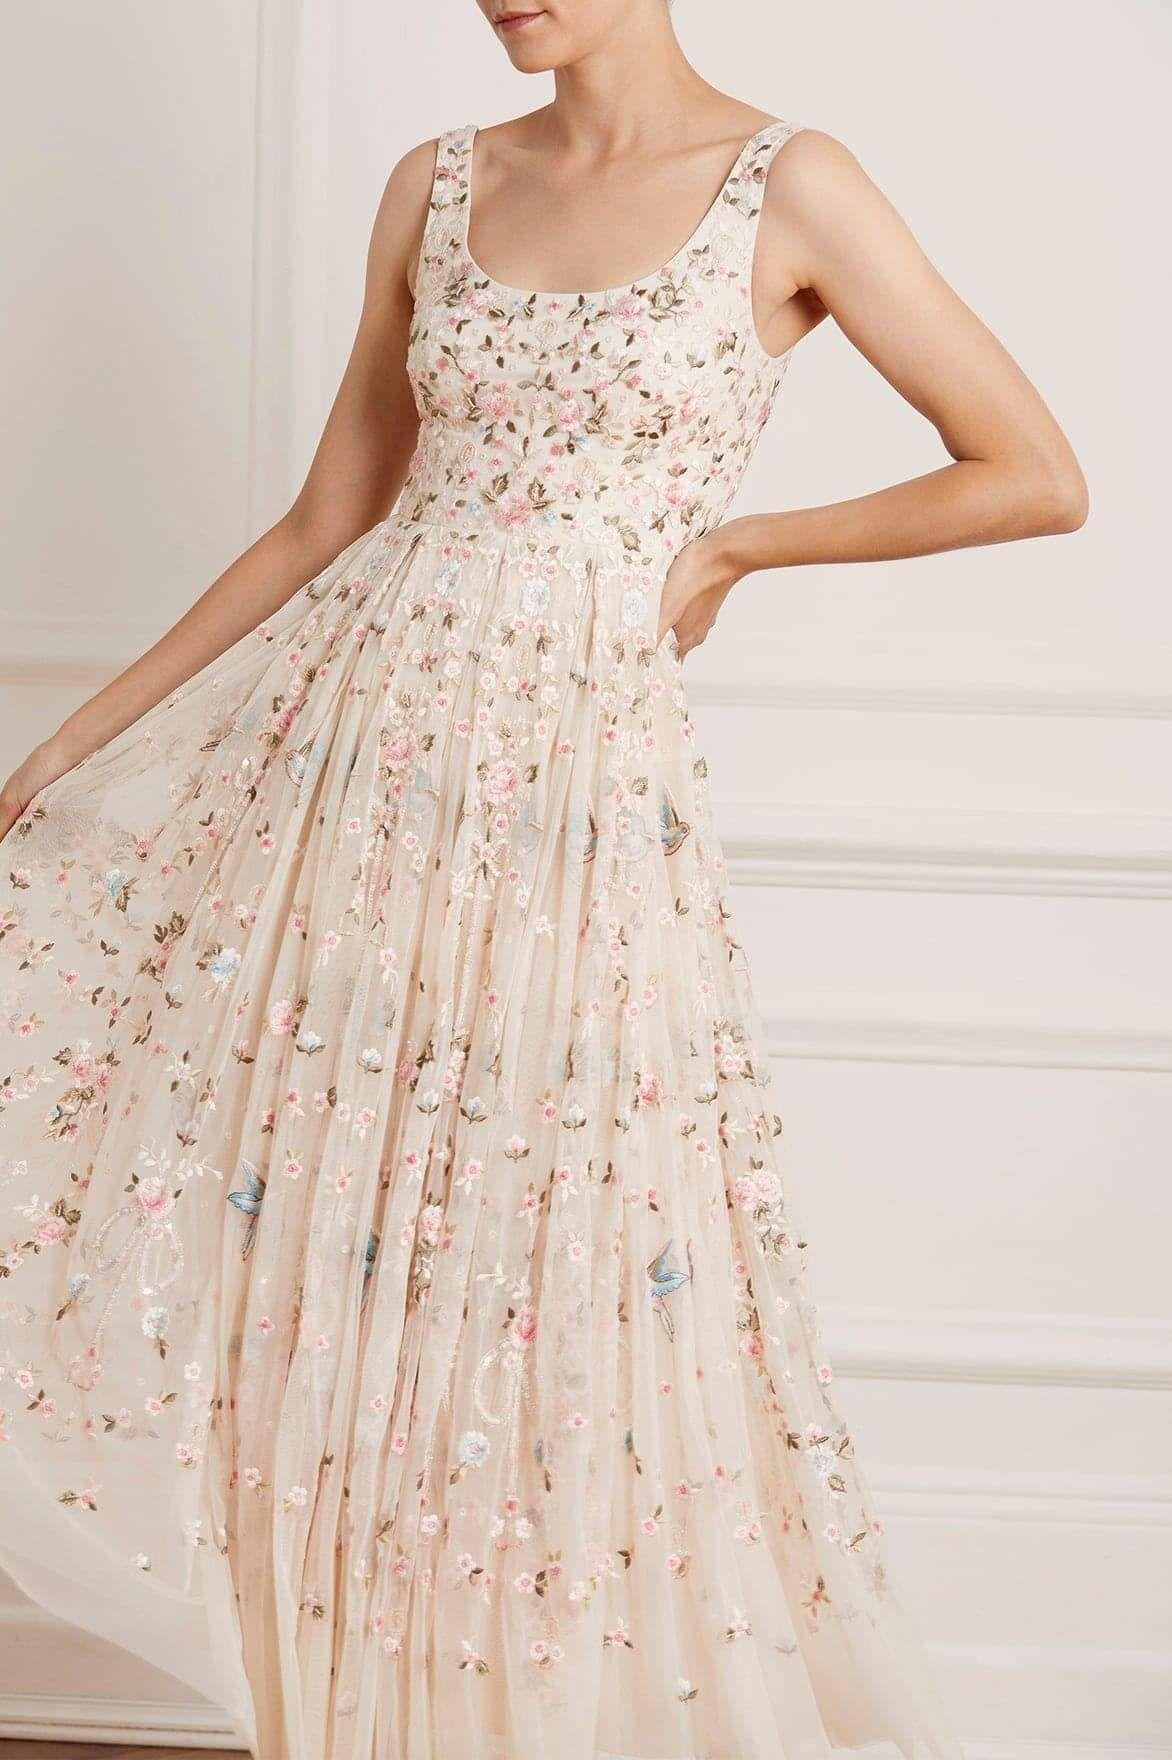 Regency Garden Ballerina Prom Dress Floral Prom Dresses Prom Dresses Vintage Dresses [ 1760 x 1172 Pixel ]